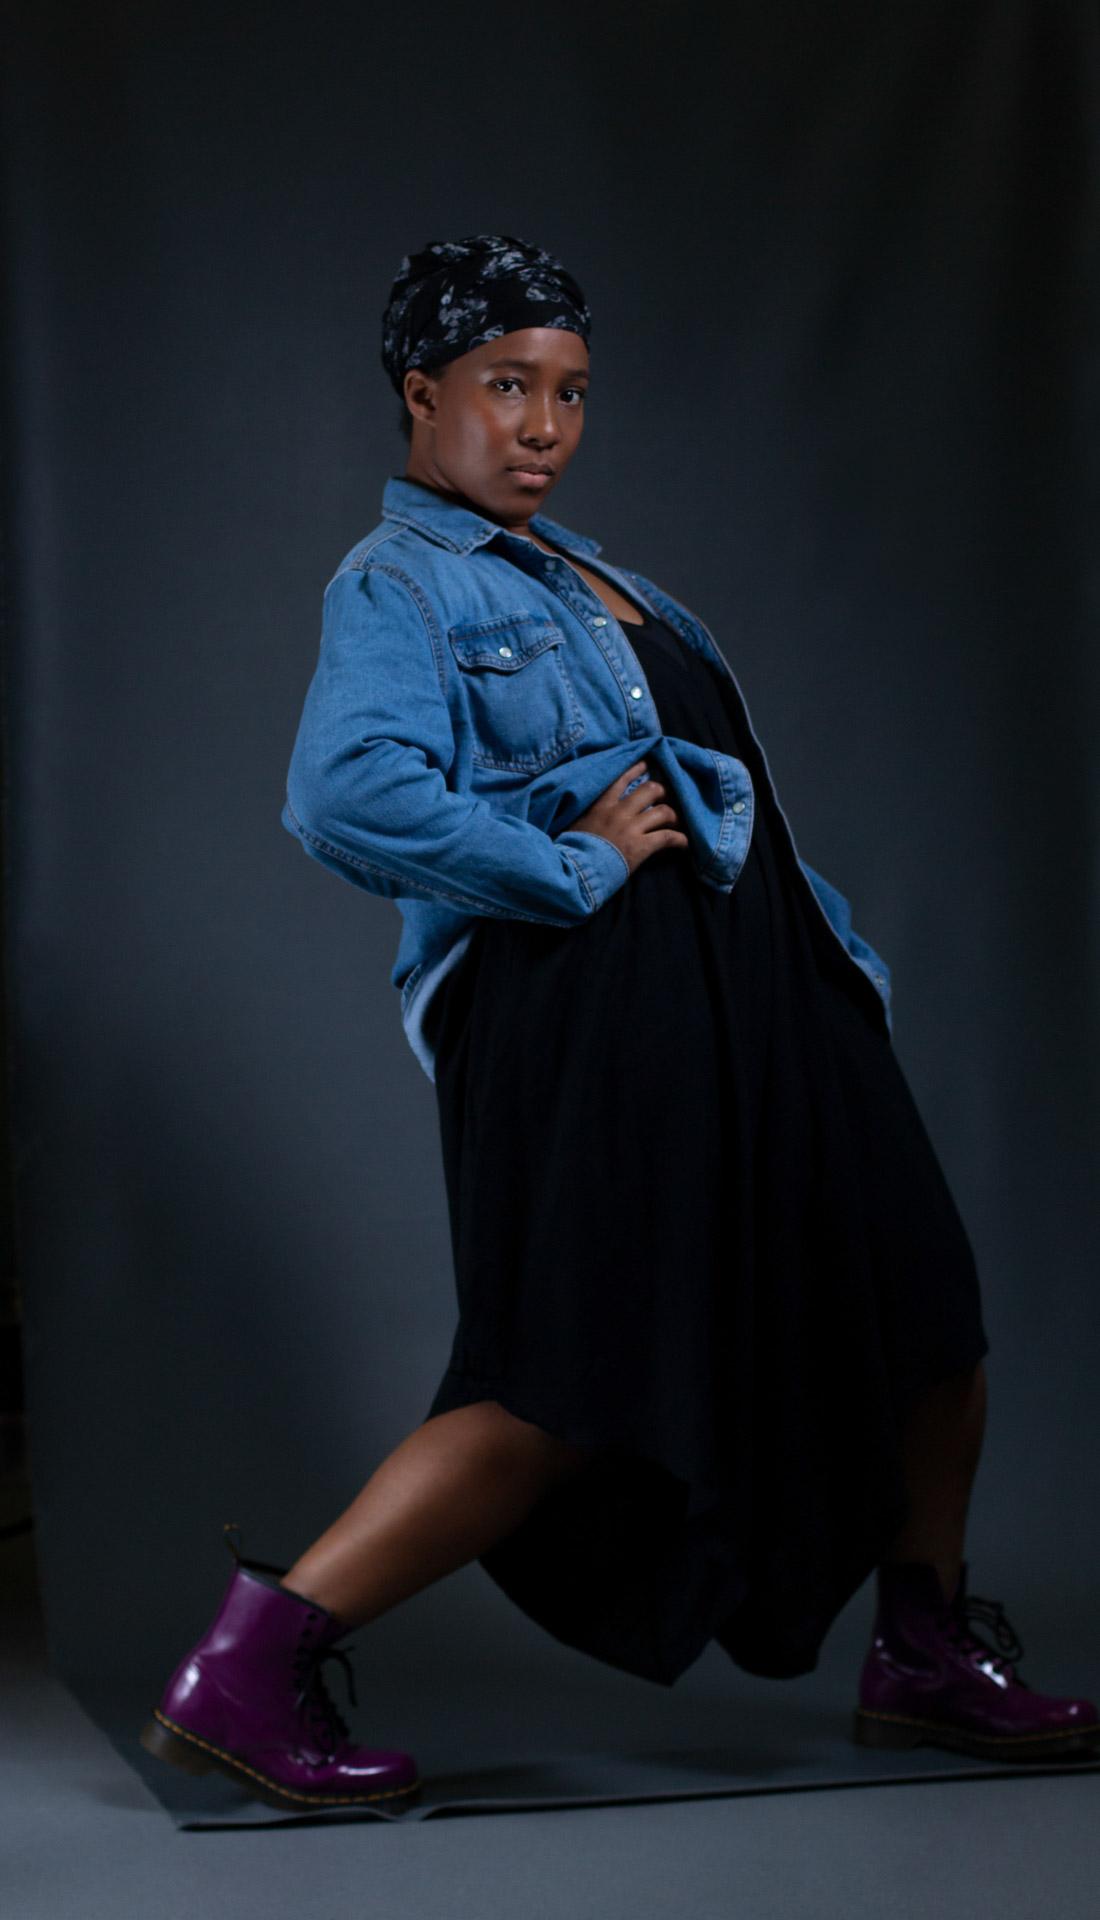 Dancer's portrait, Birmingham dance photographer, Dance portfolio photography Birmingham UK, dance portrait studio photoshoot in Birmingham UK